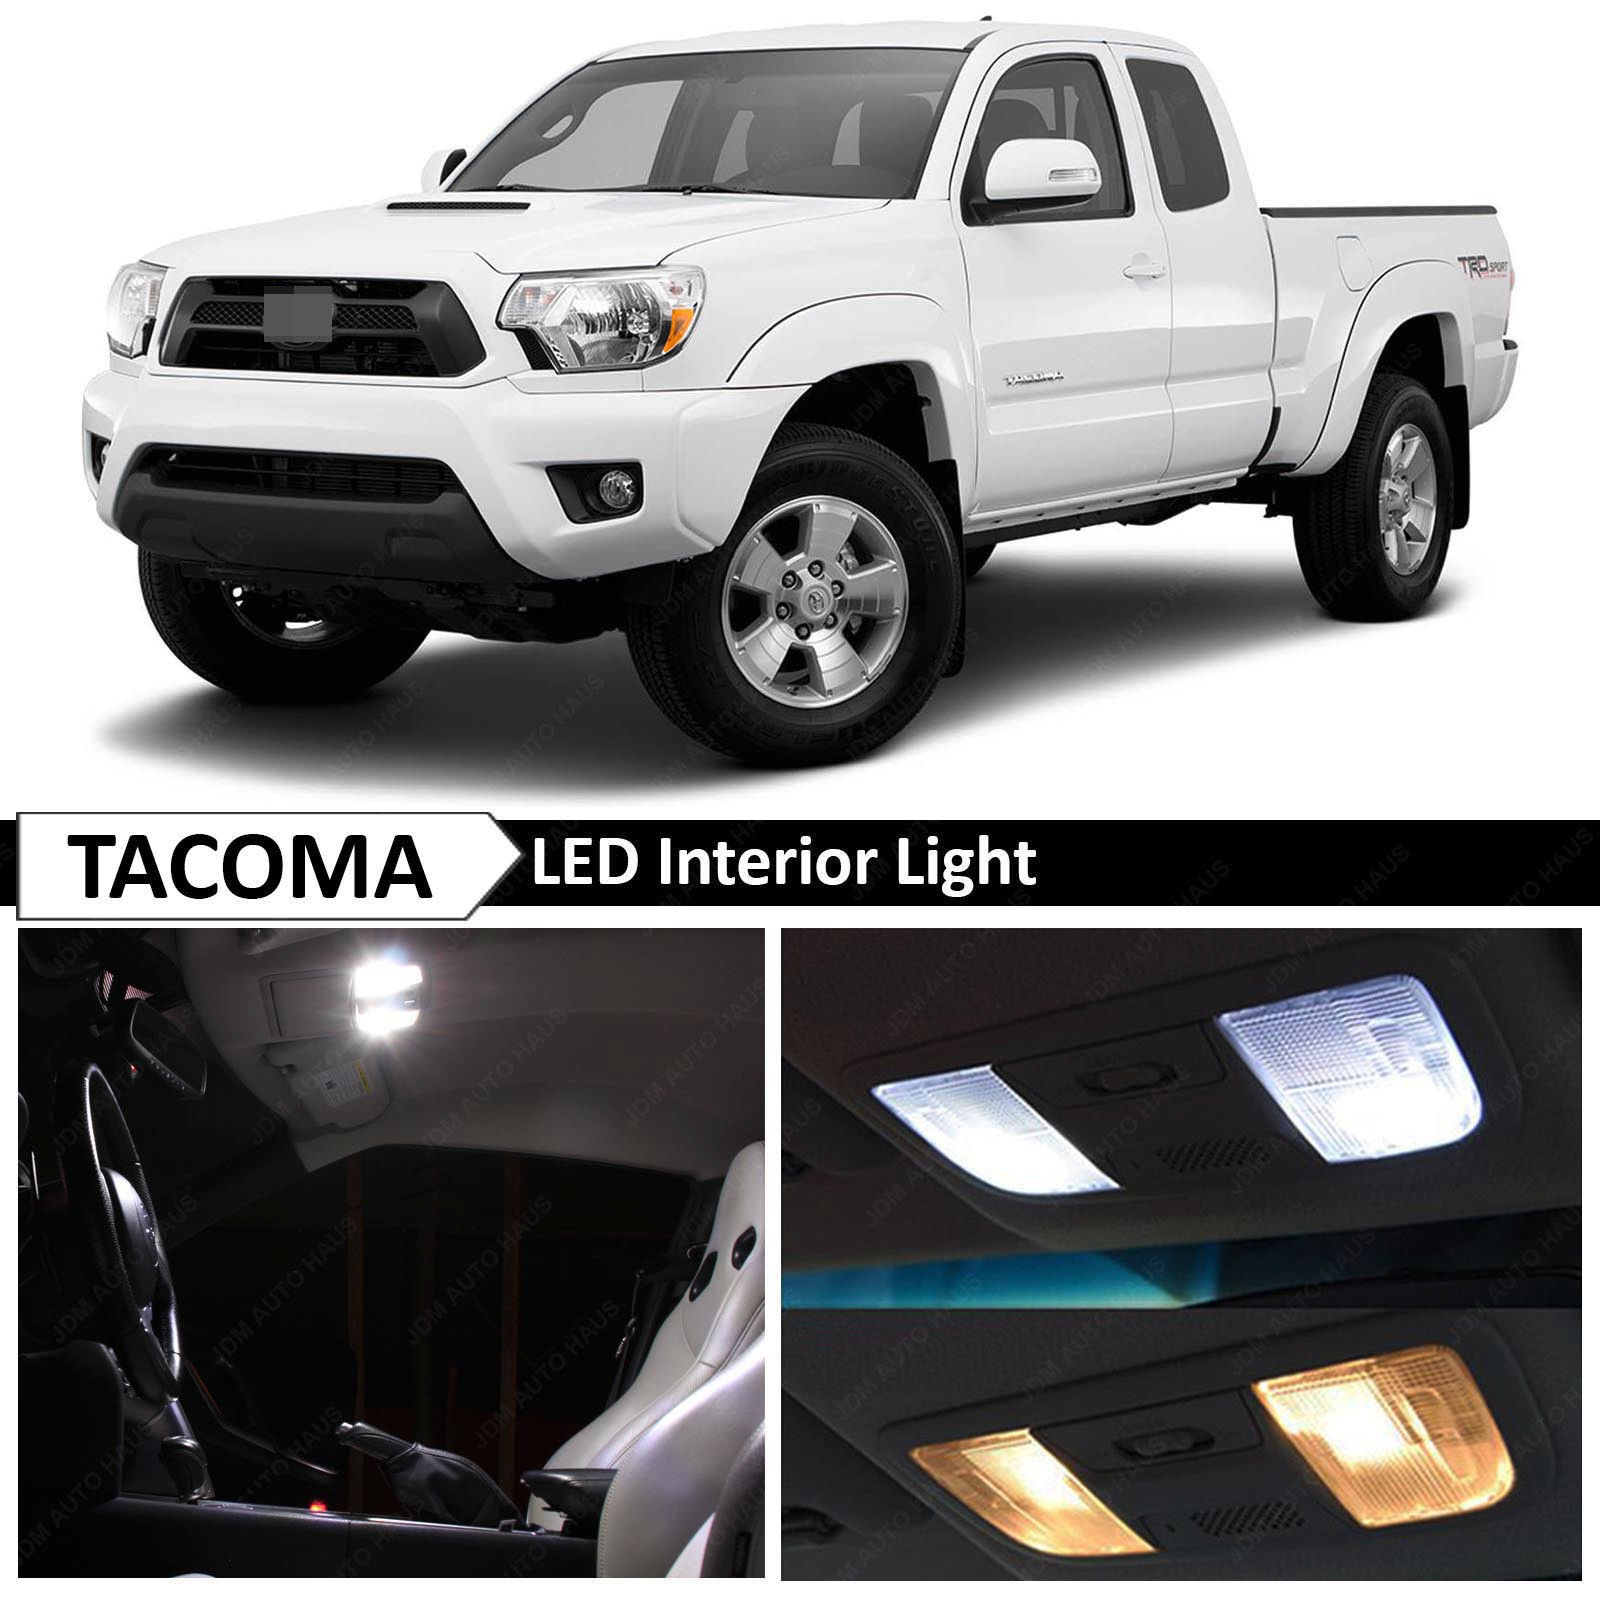 2018 tacoma interior lights